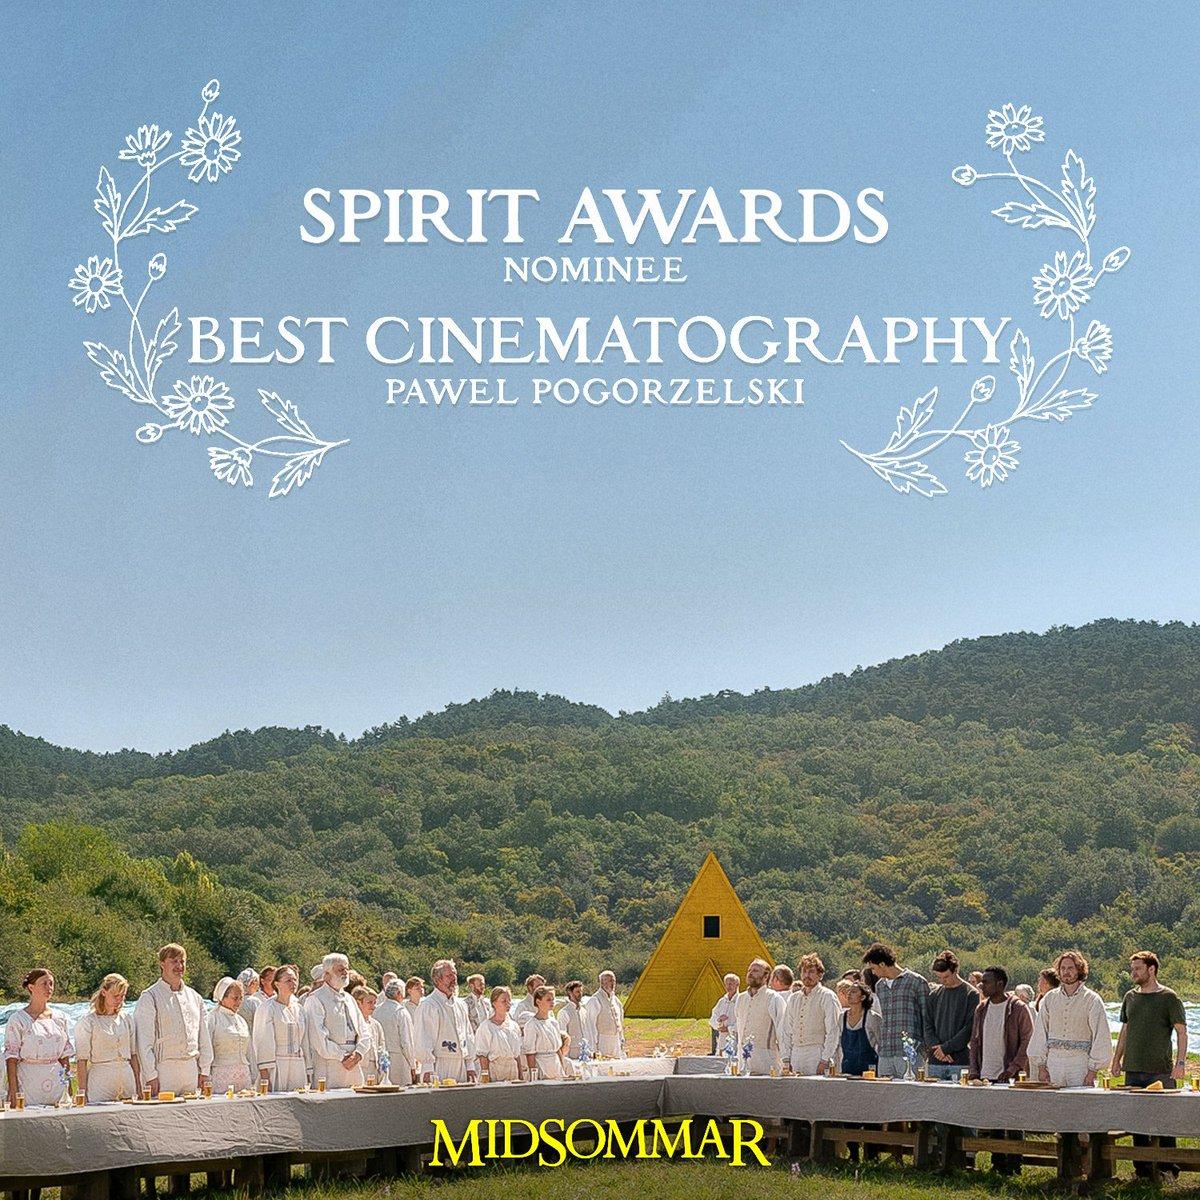 @MidsommarMovie's photo on #SpiritAwards